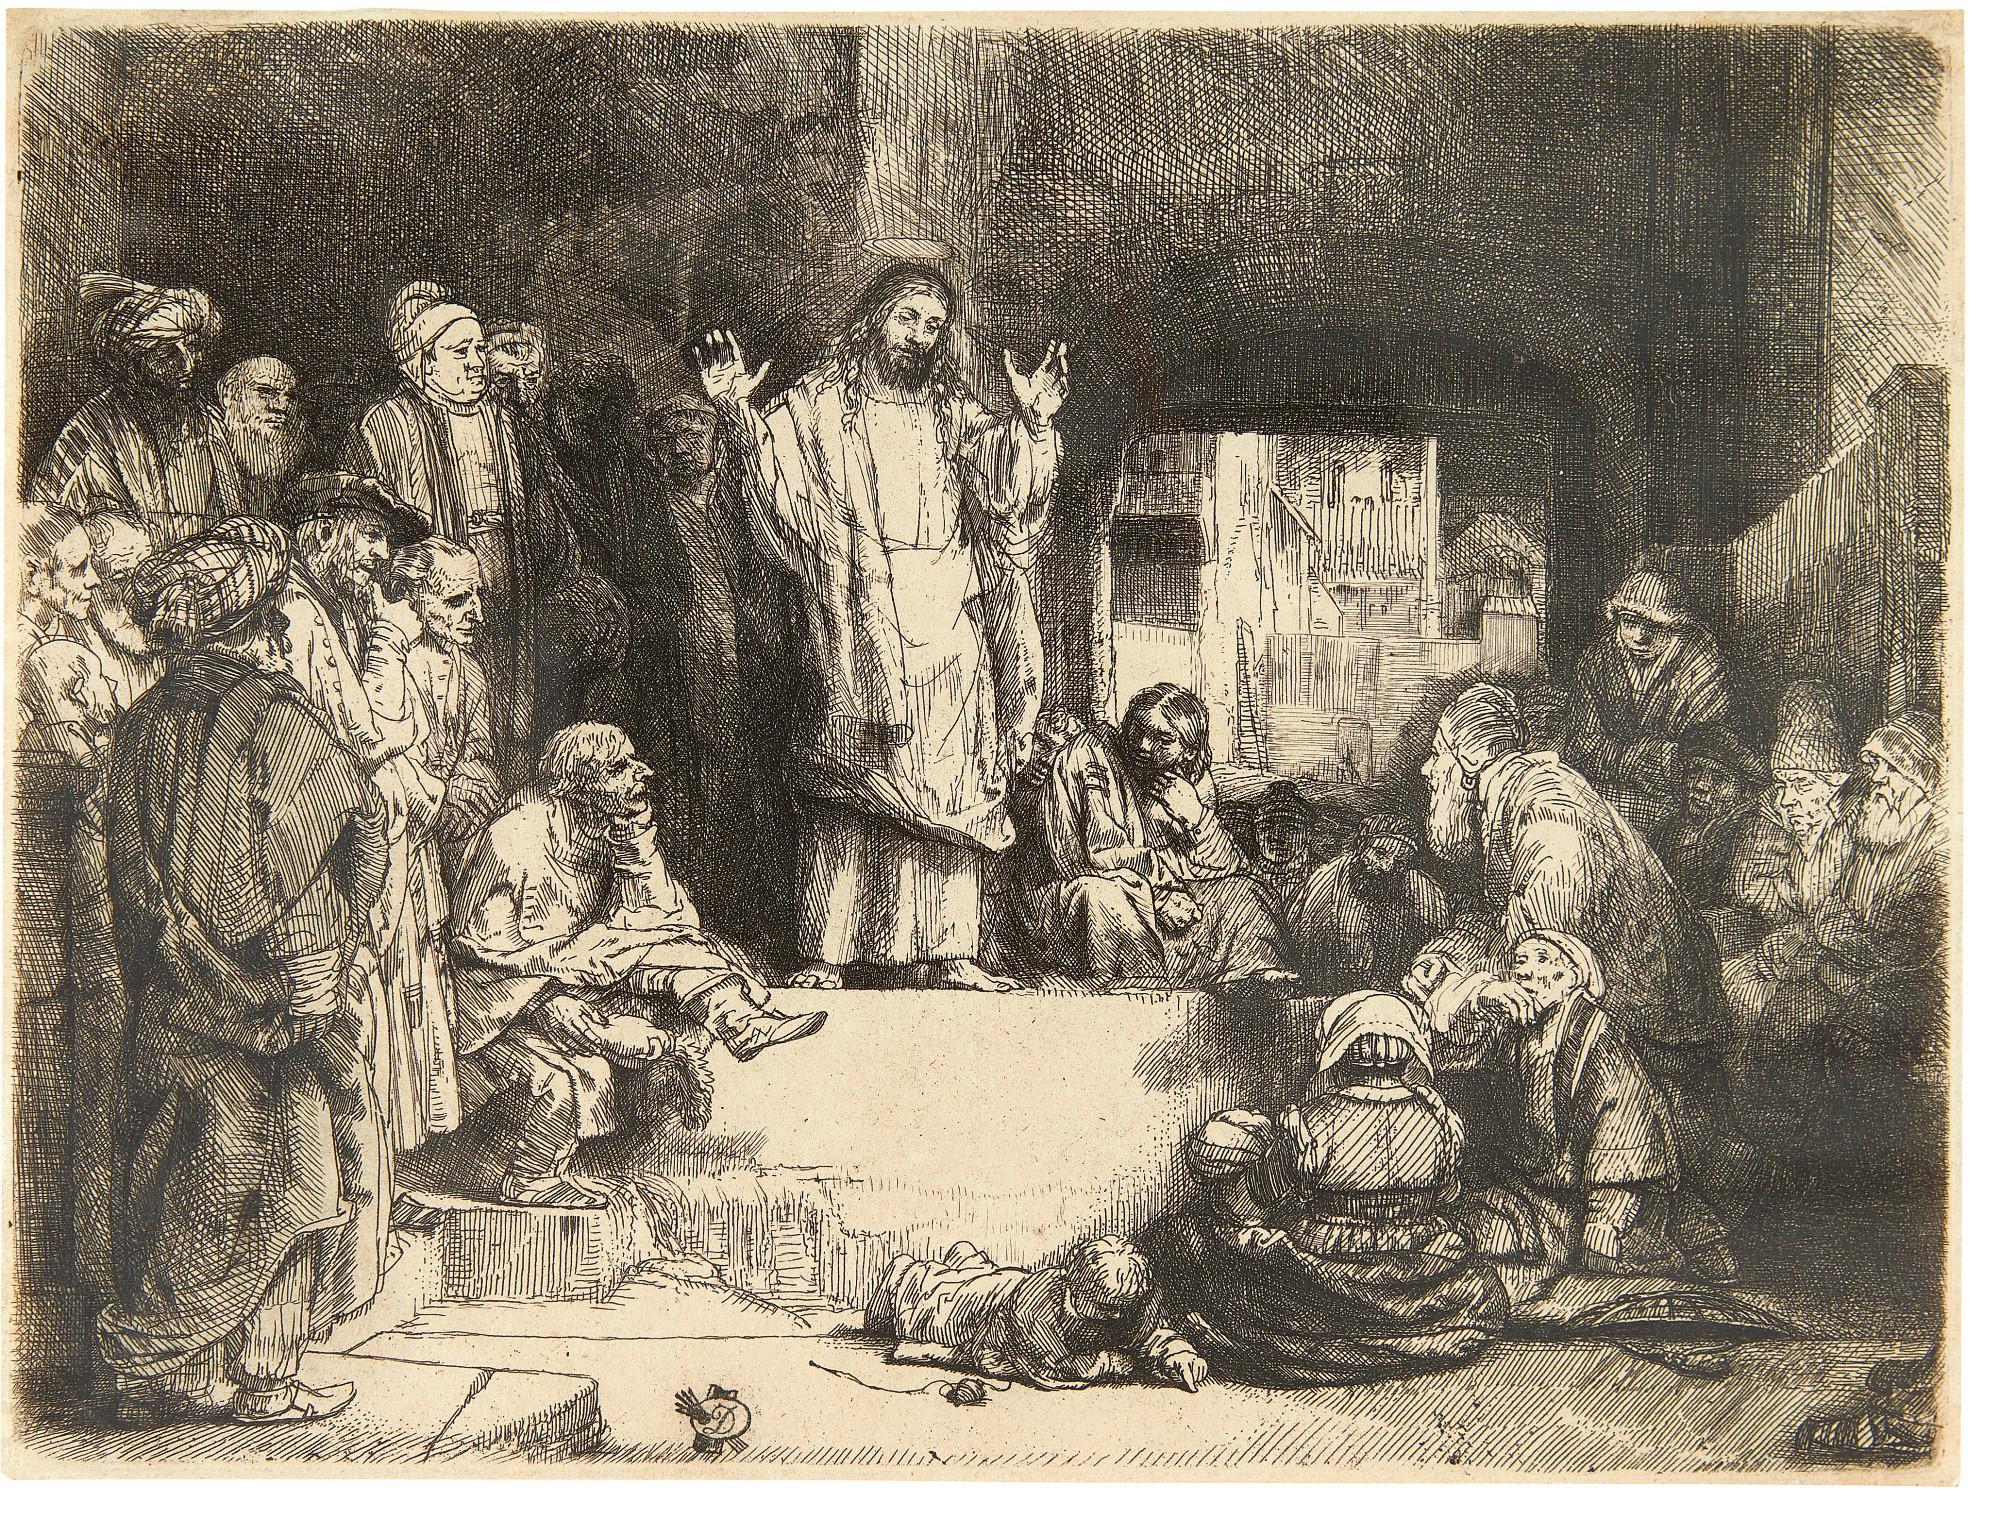 REMBRANDT HARMENSZ. VAN RIJN   CHRIST PREACHING ('LA PETITE TOMBE') (B., HOLL. 67; NEW HOLL. 298; H. 256)